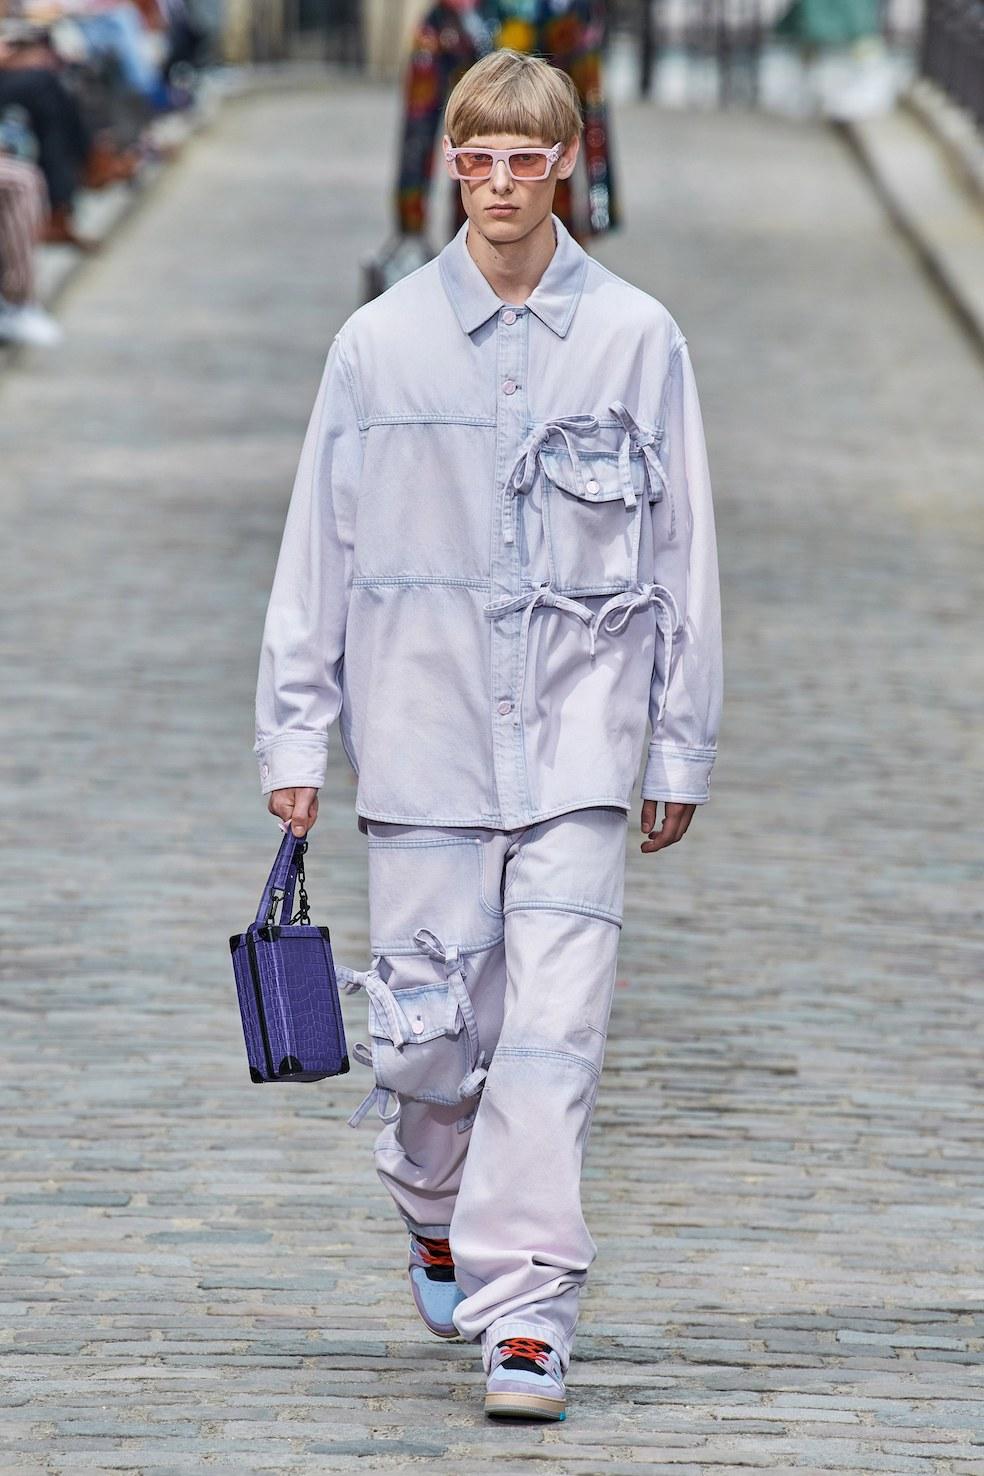 Louis_Vuitton_SS20_Behind_The_Blinds_Magazine__FIO0263.jpg